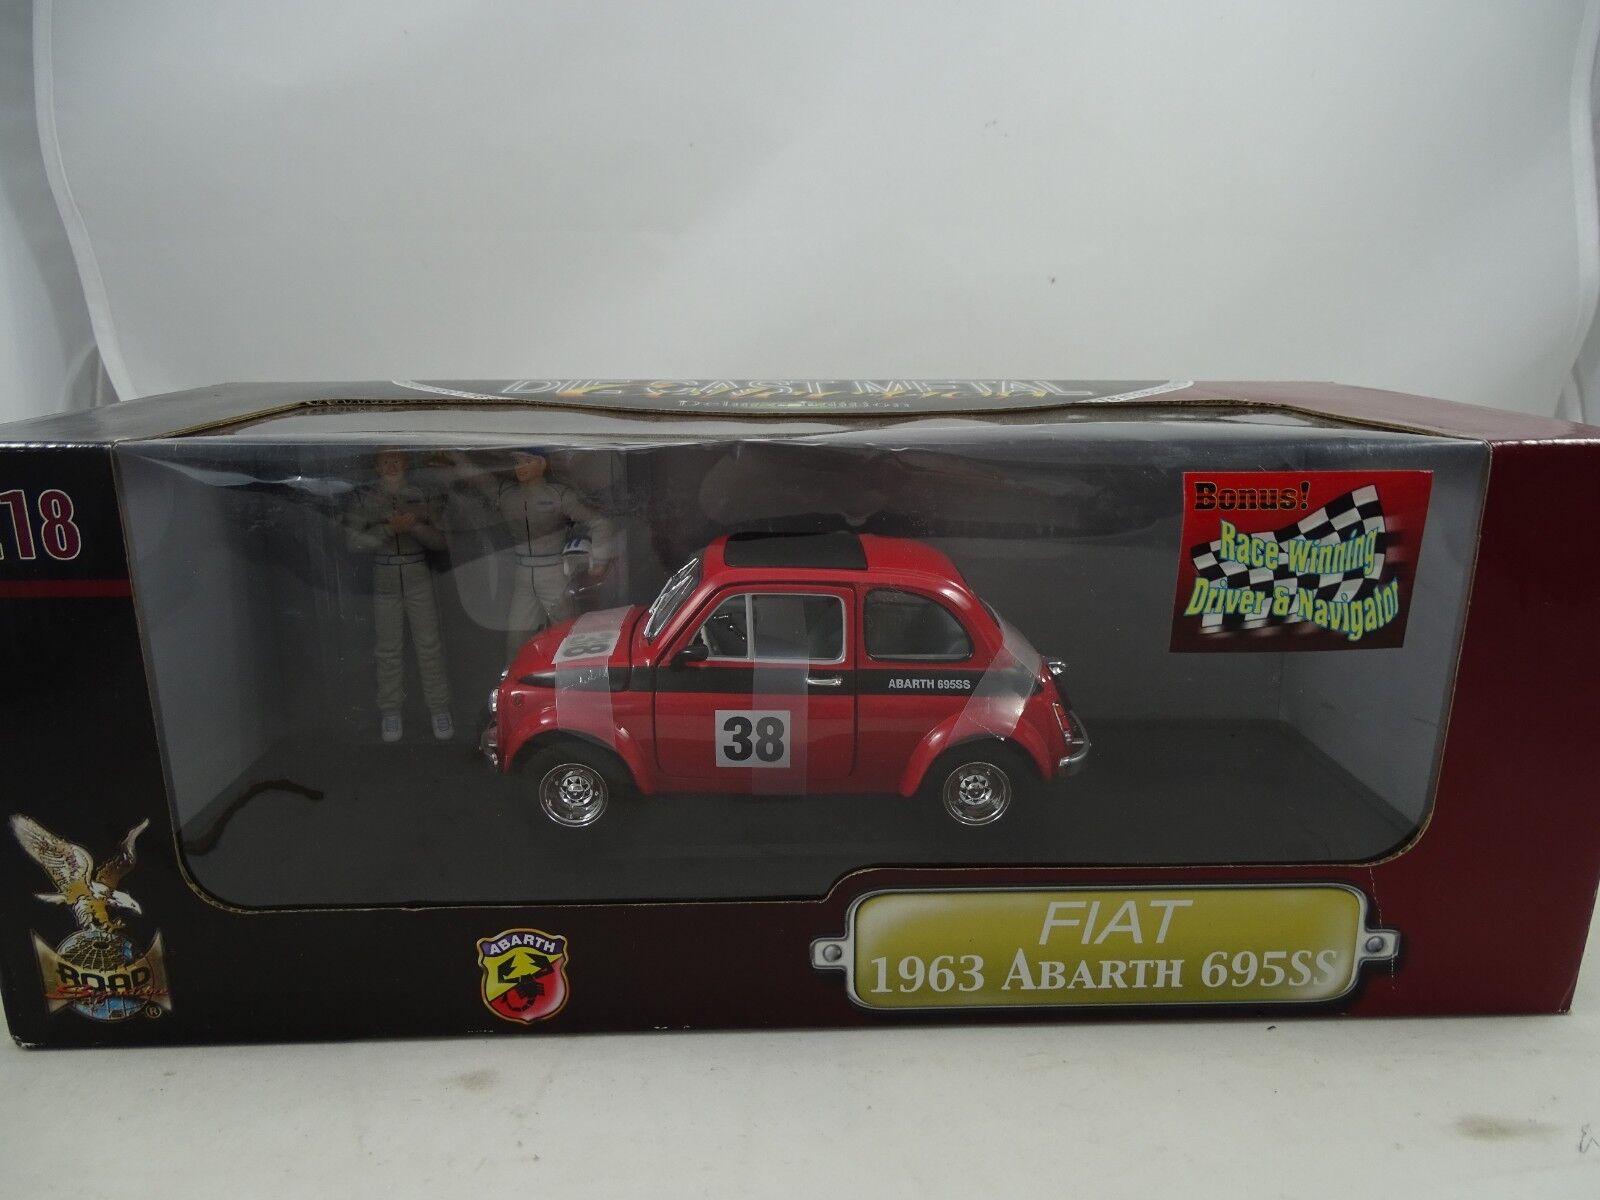 1 18 Road Signate  92338F --Fiat 1963 Abarth 695SS ;38 Figuren --Rareza